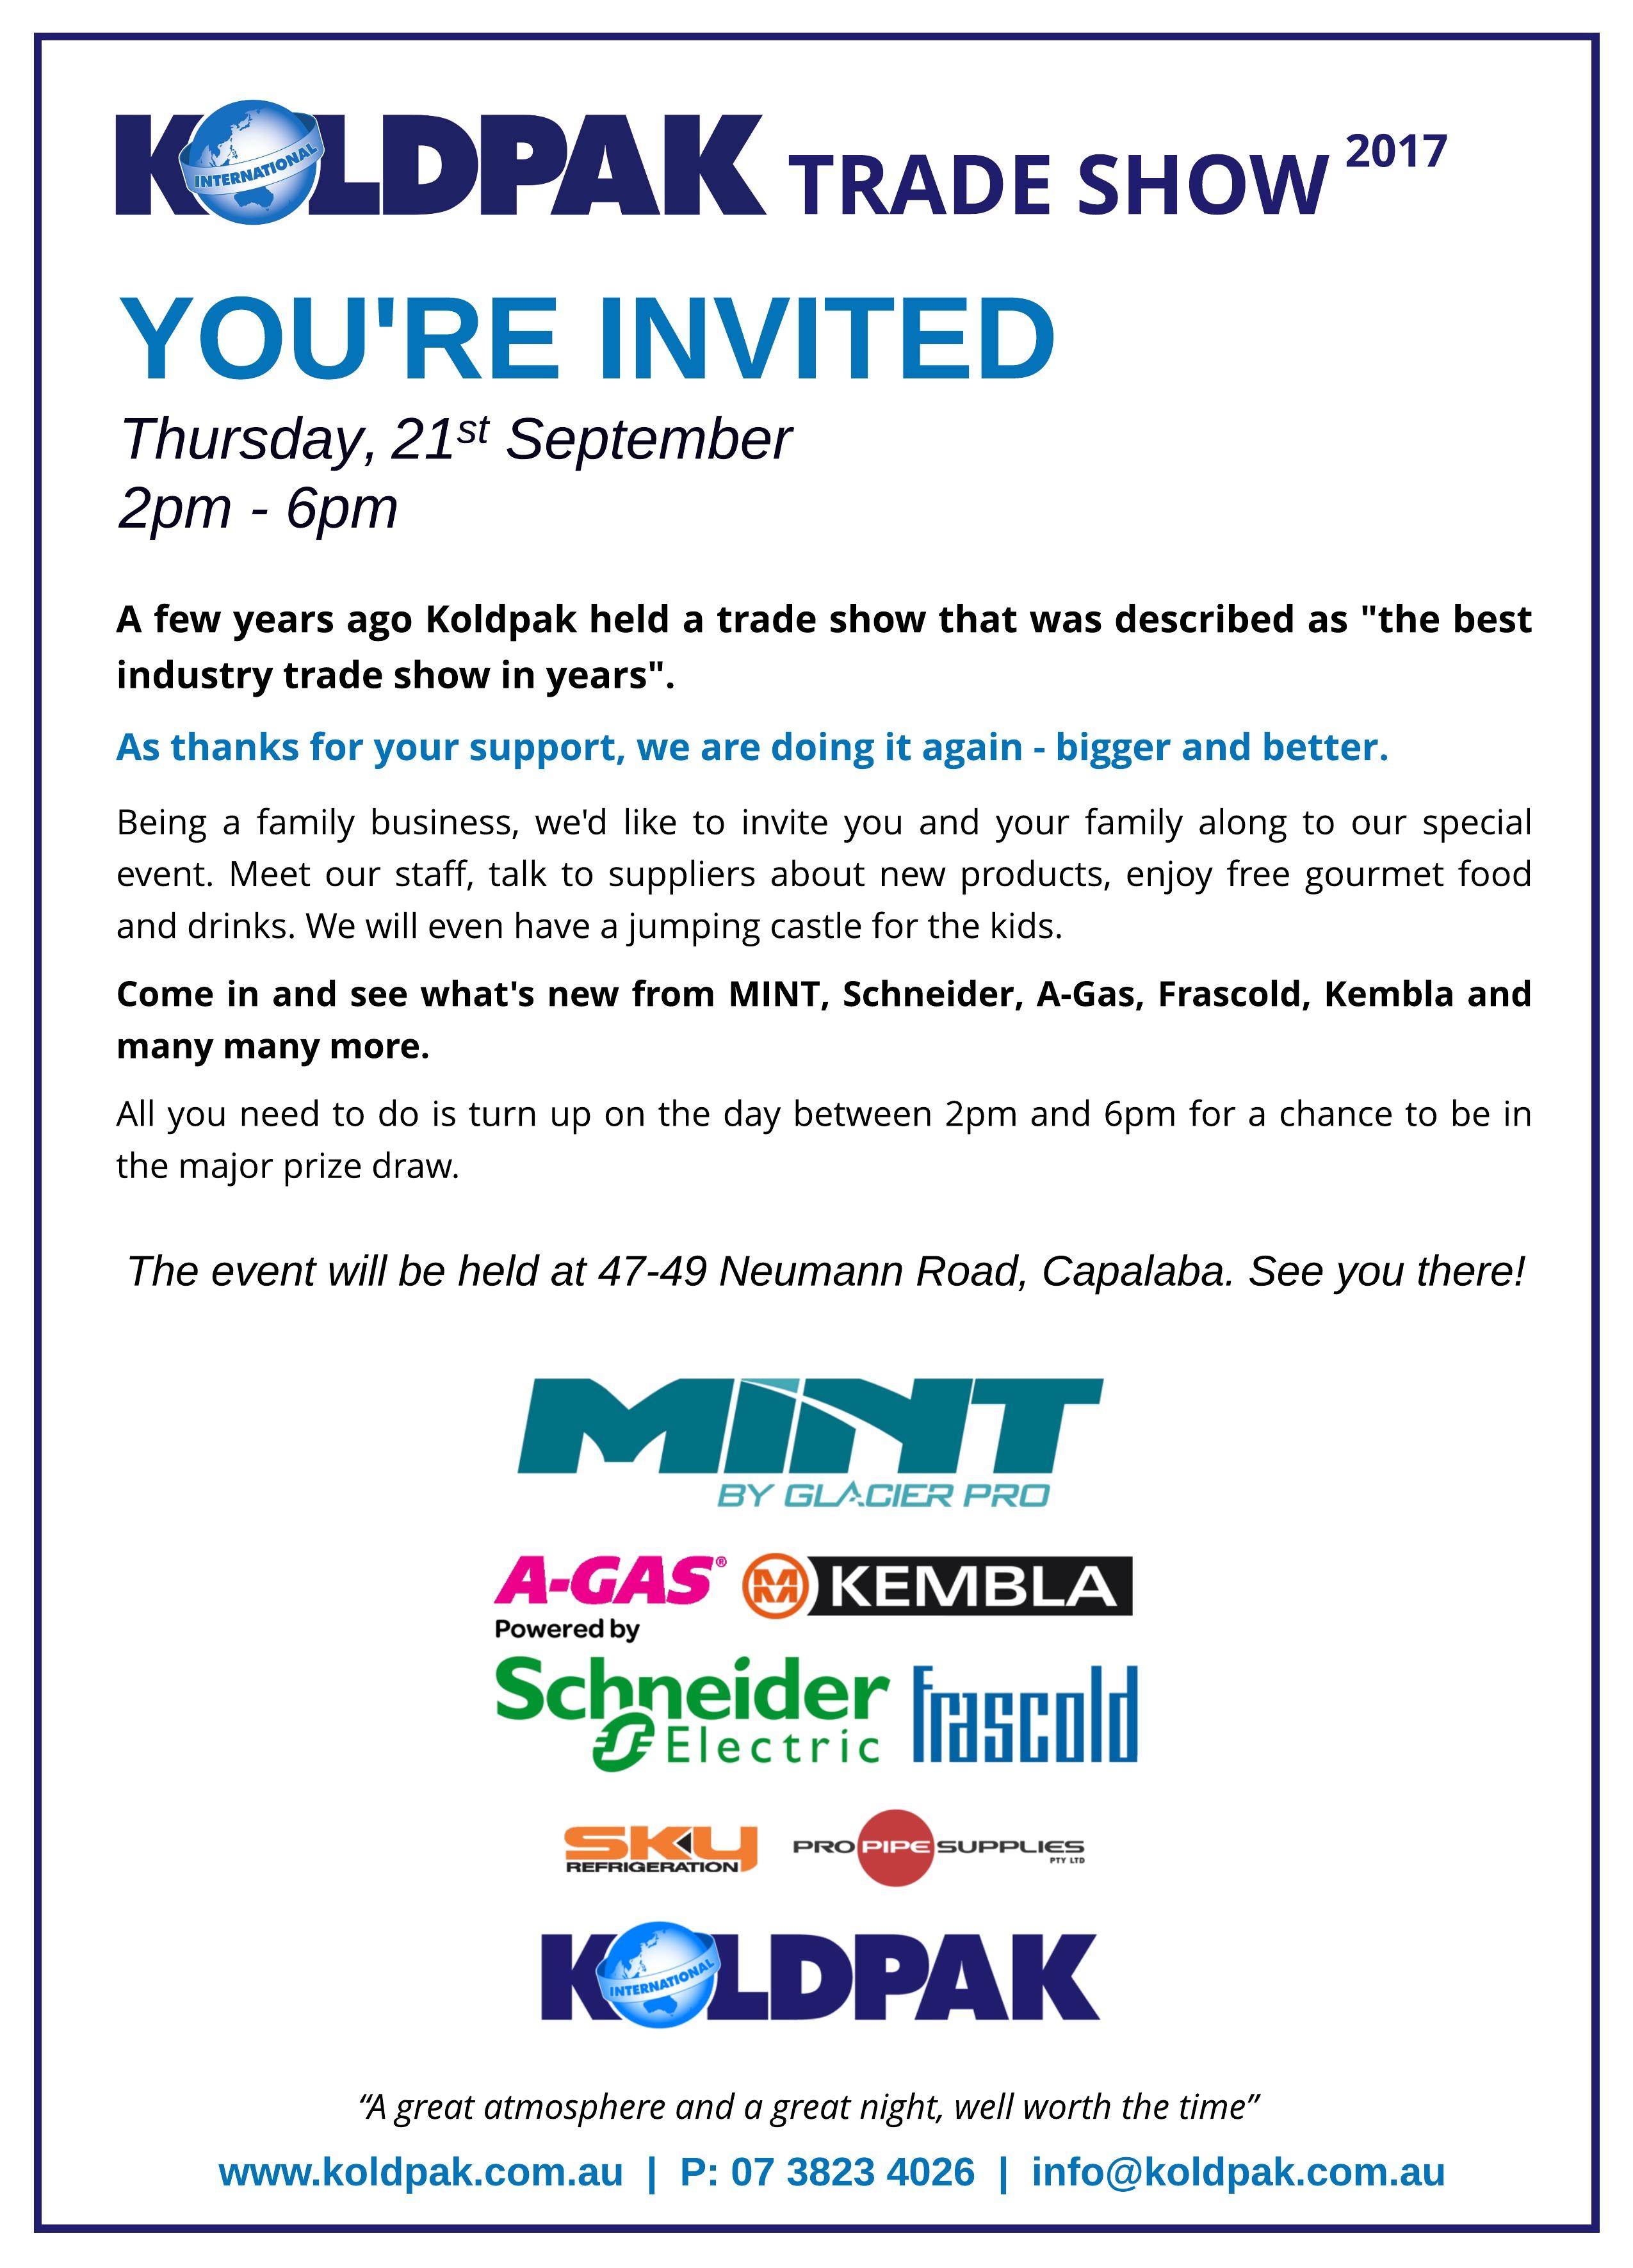 Tradeshow Invitation Koldpak